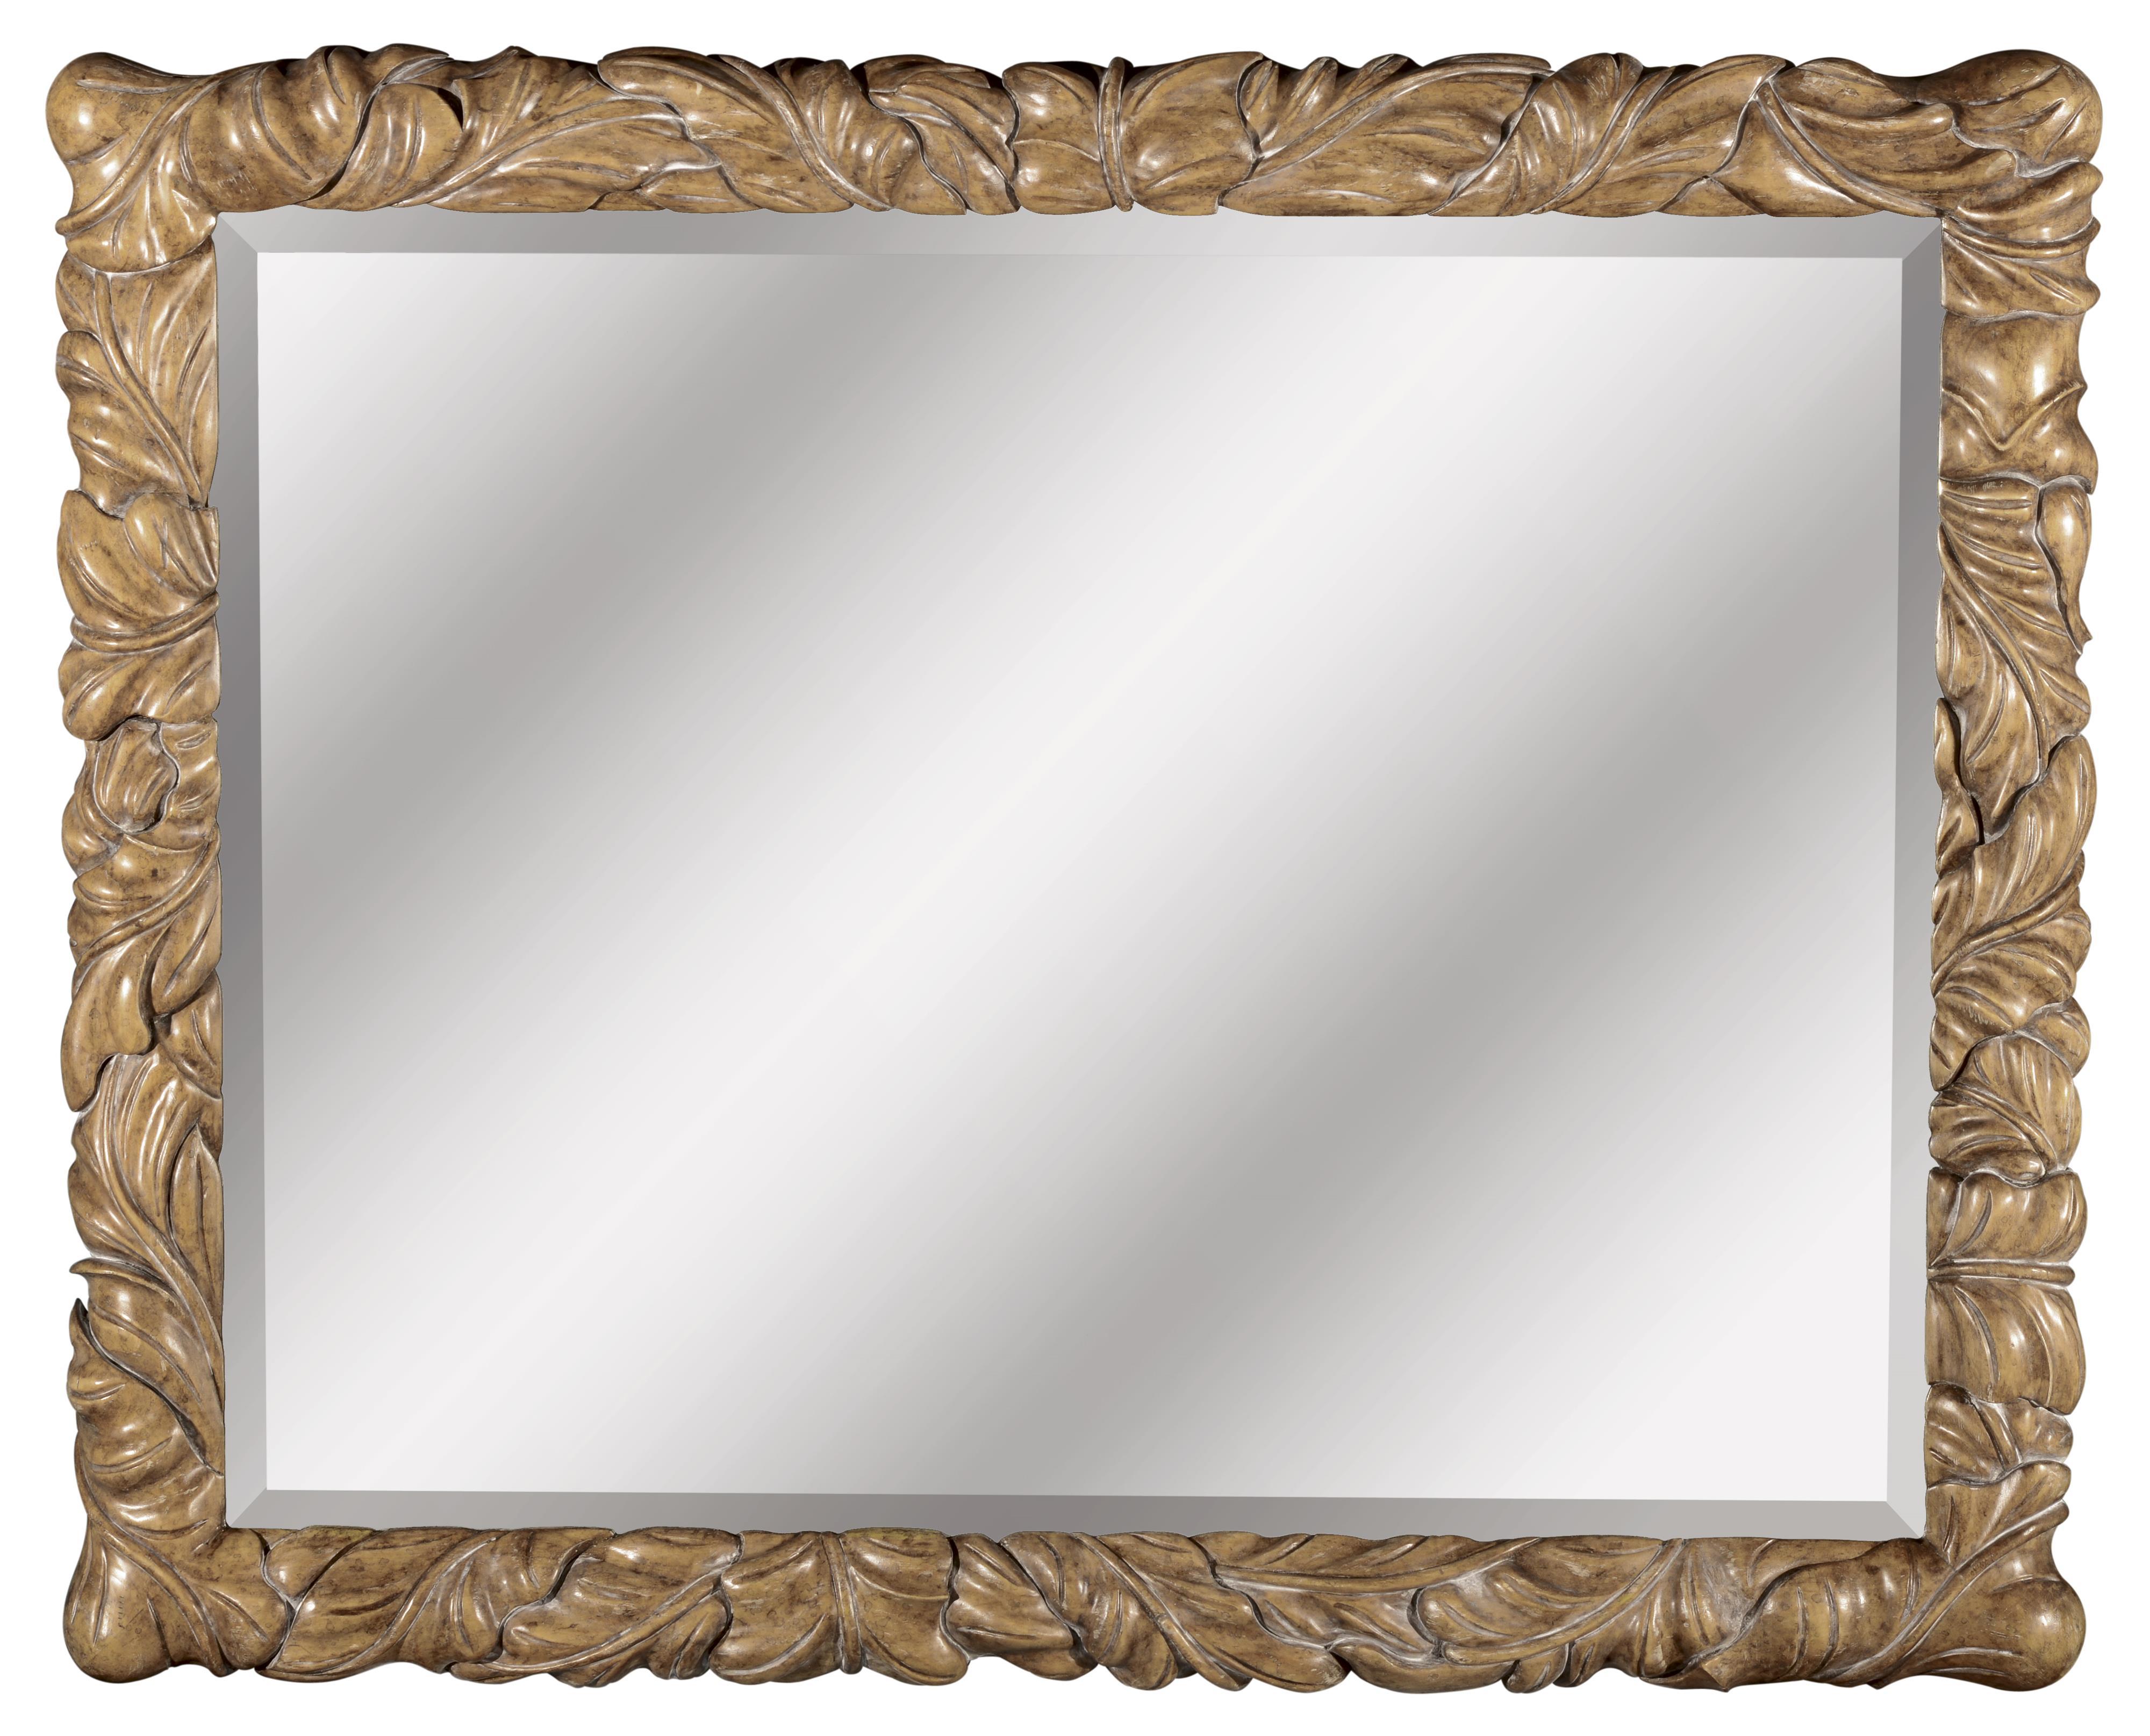 A.R.T. Furniture Inc Pavilion Landscape Mirror - Item Number: 229120-2608